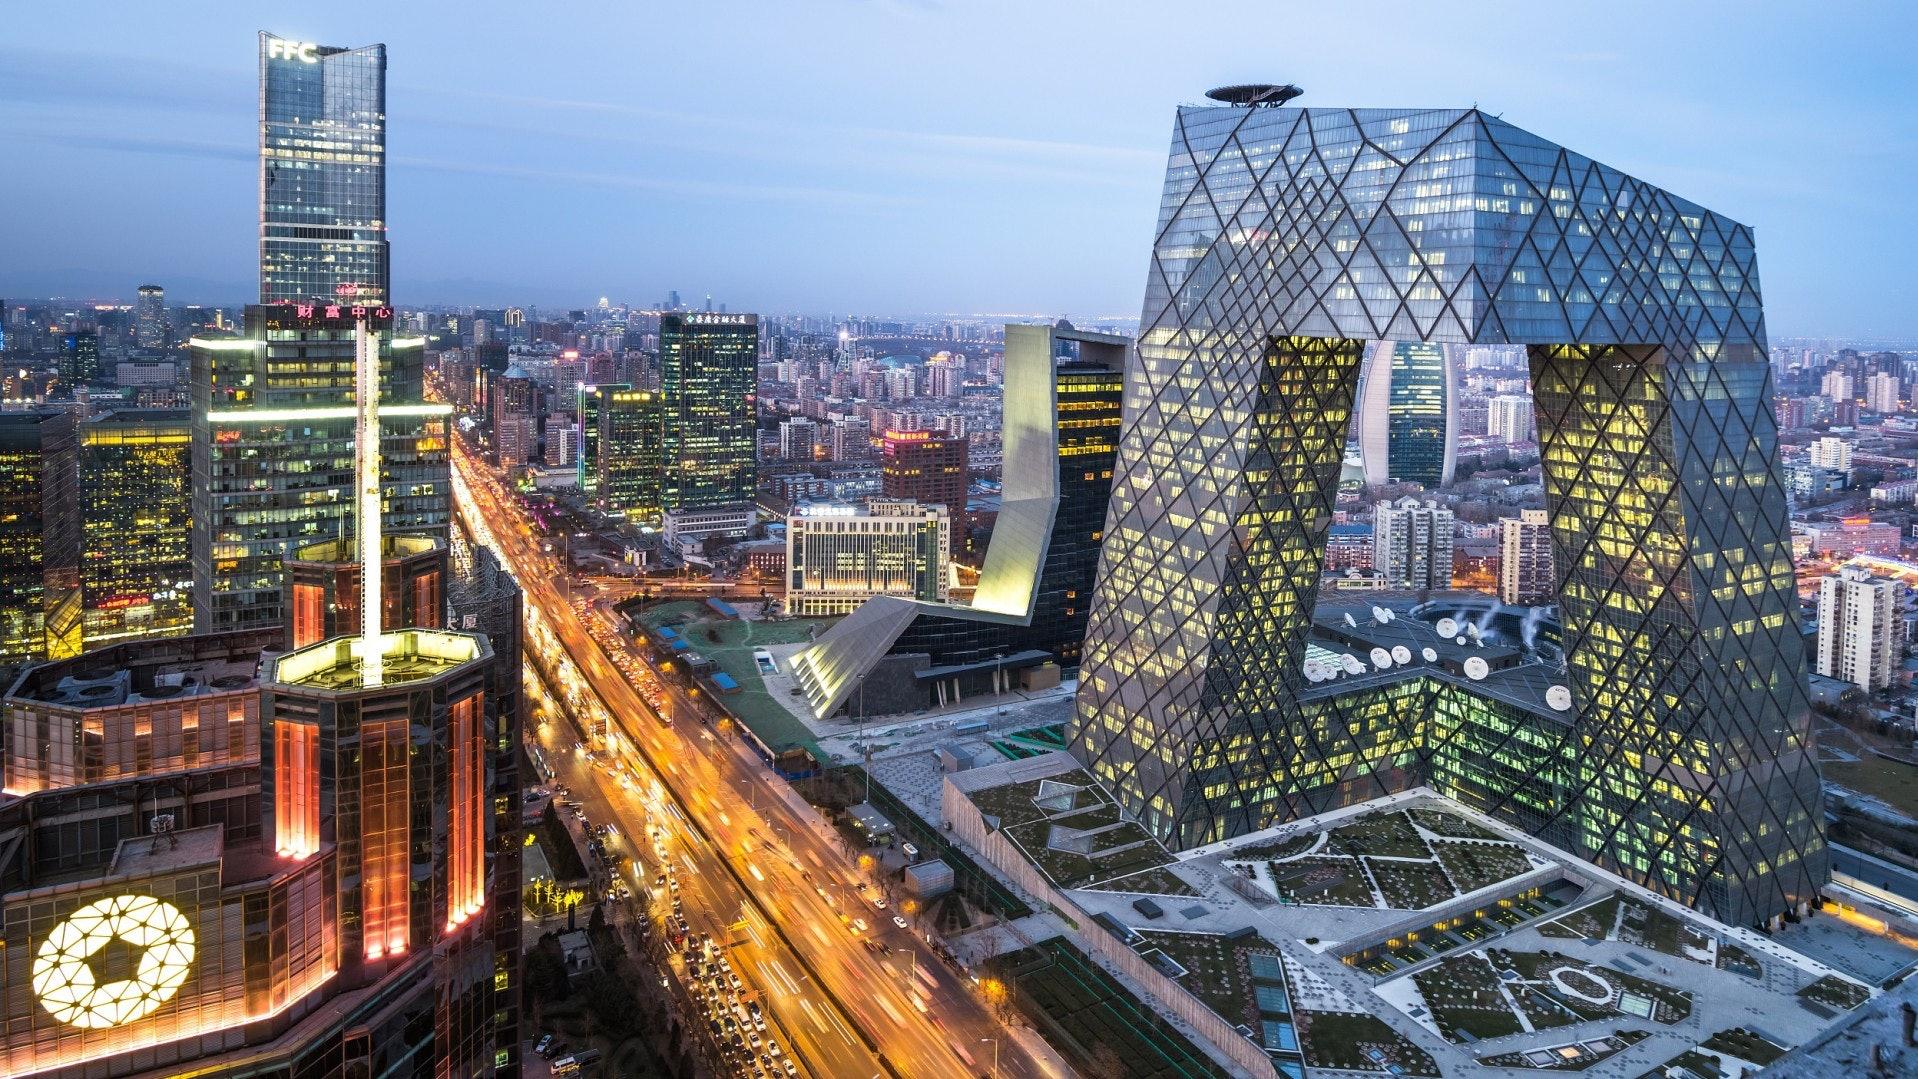 CHINA IS UNDERGOING RAPID ECONOMIC GROWTH